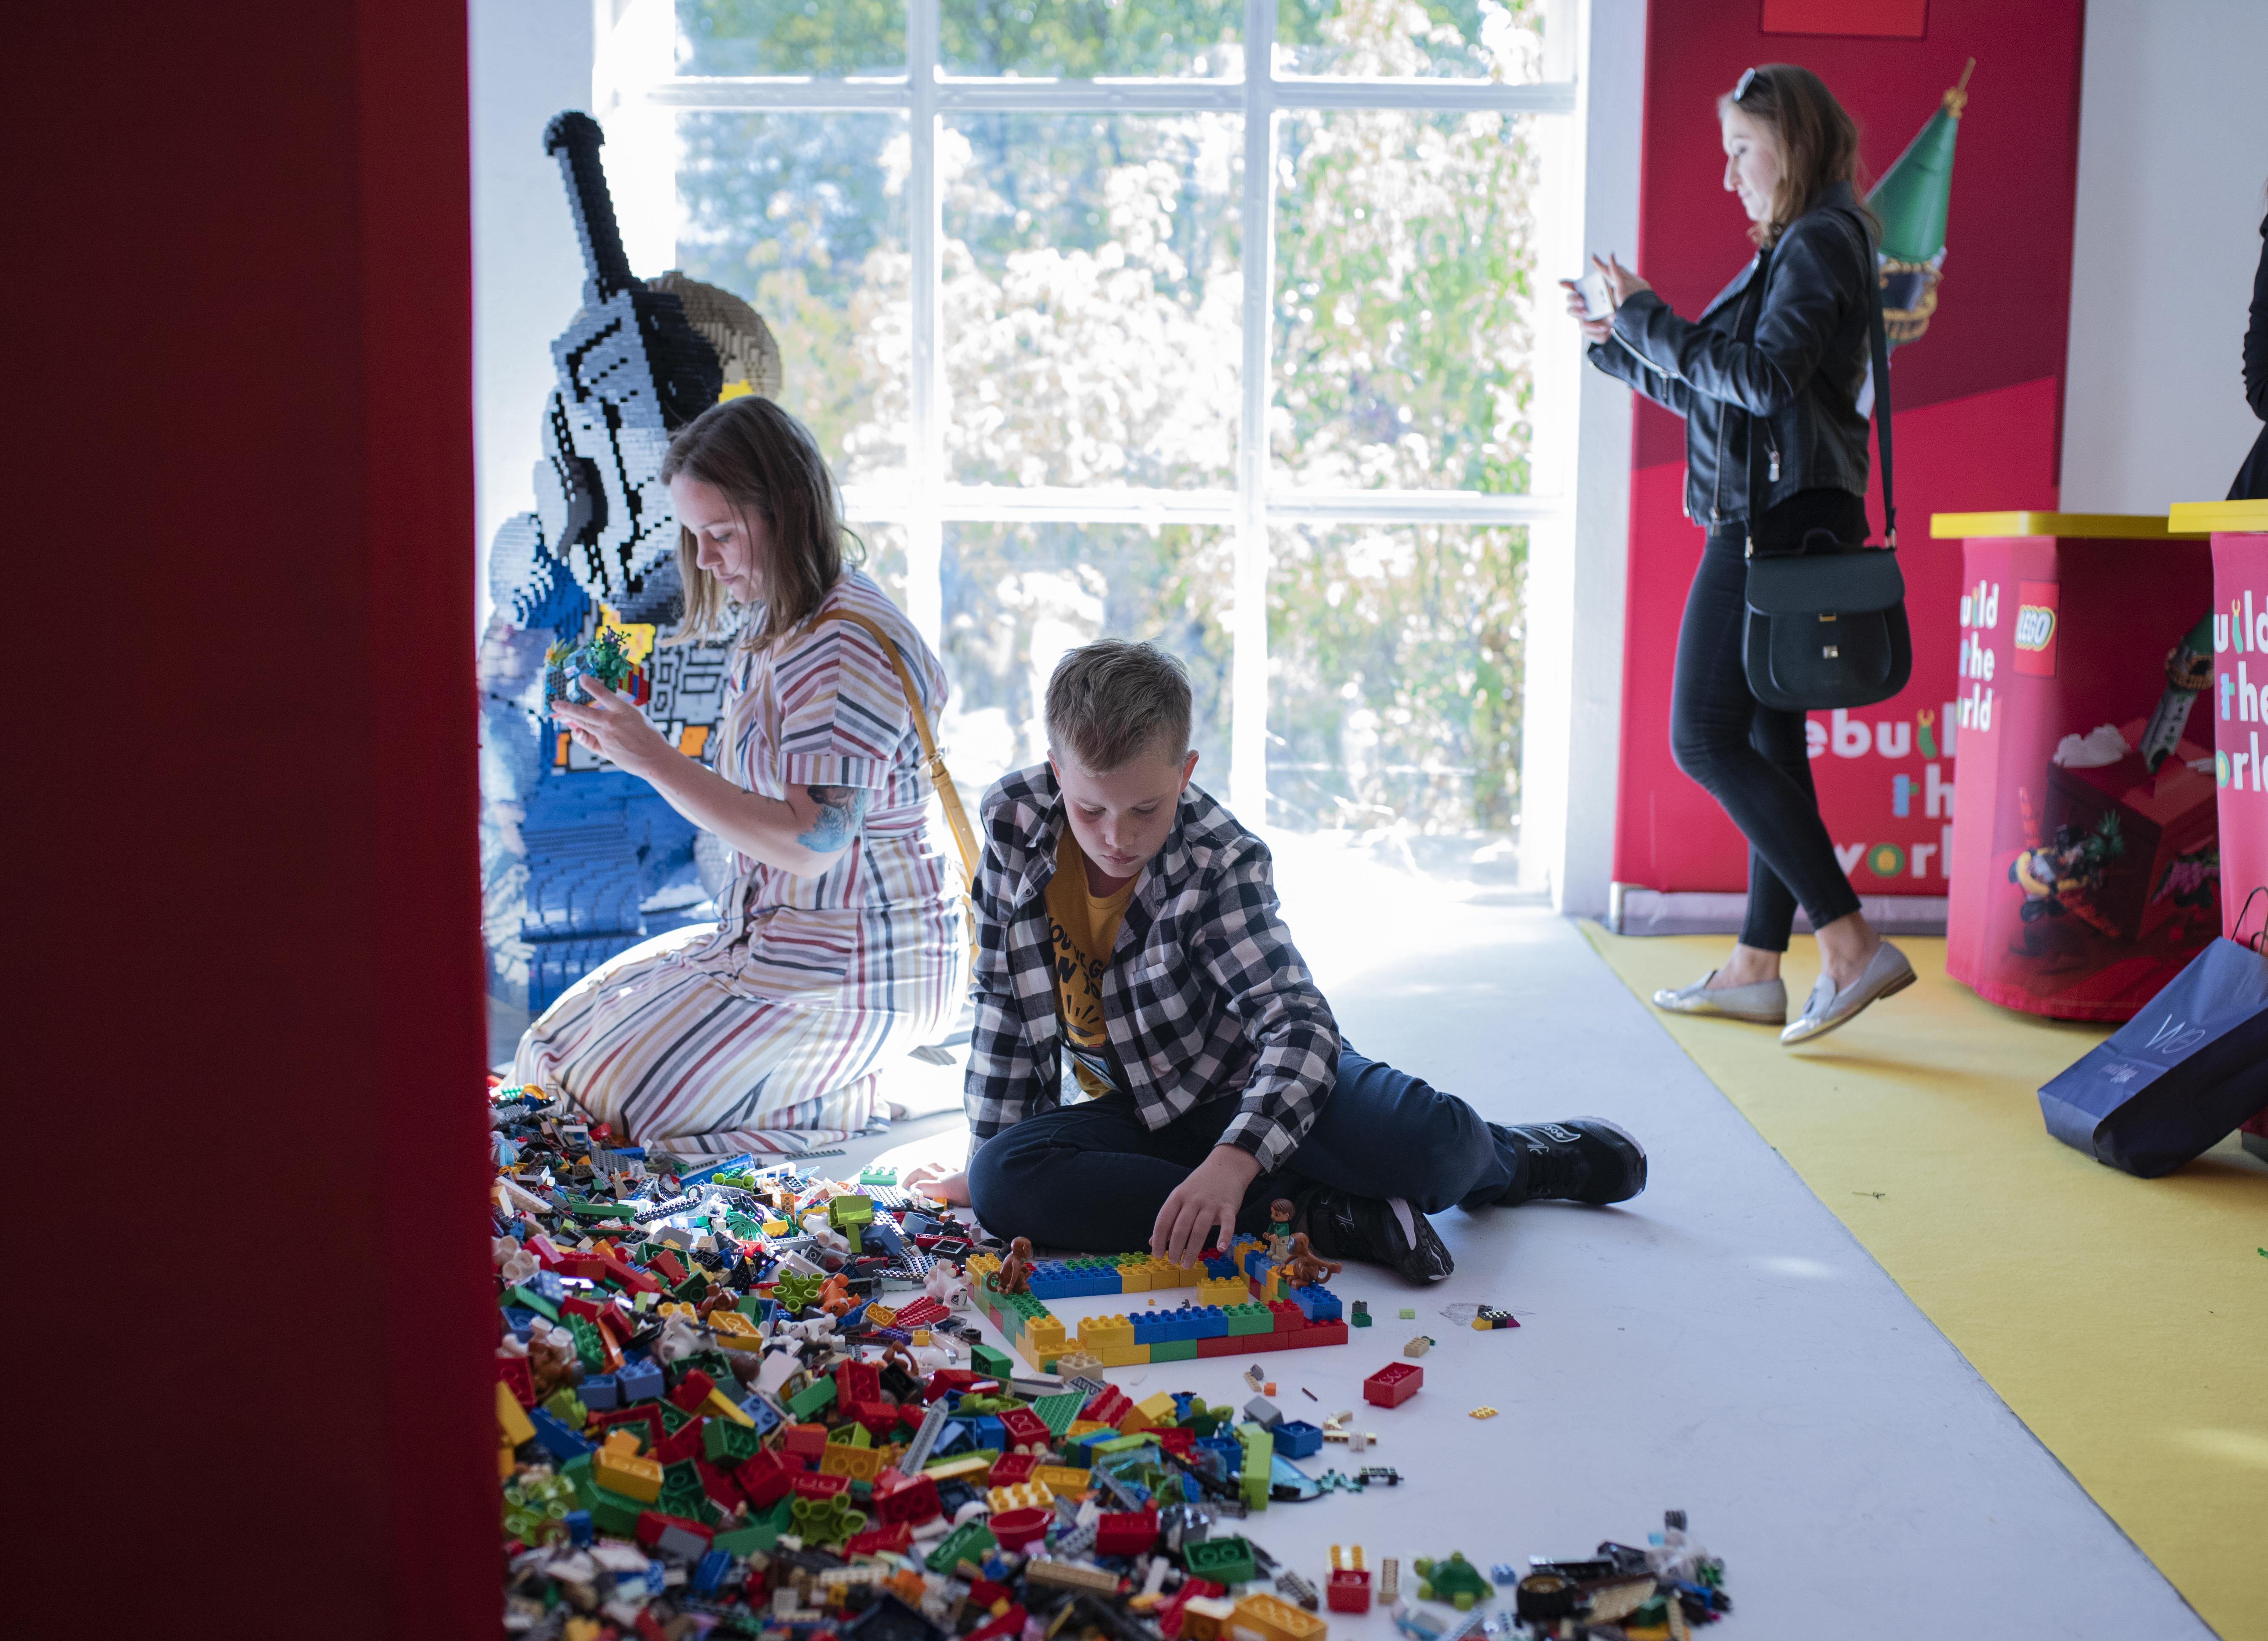 lego, rebuild the world